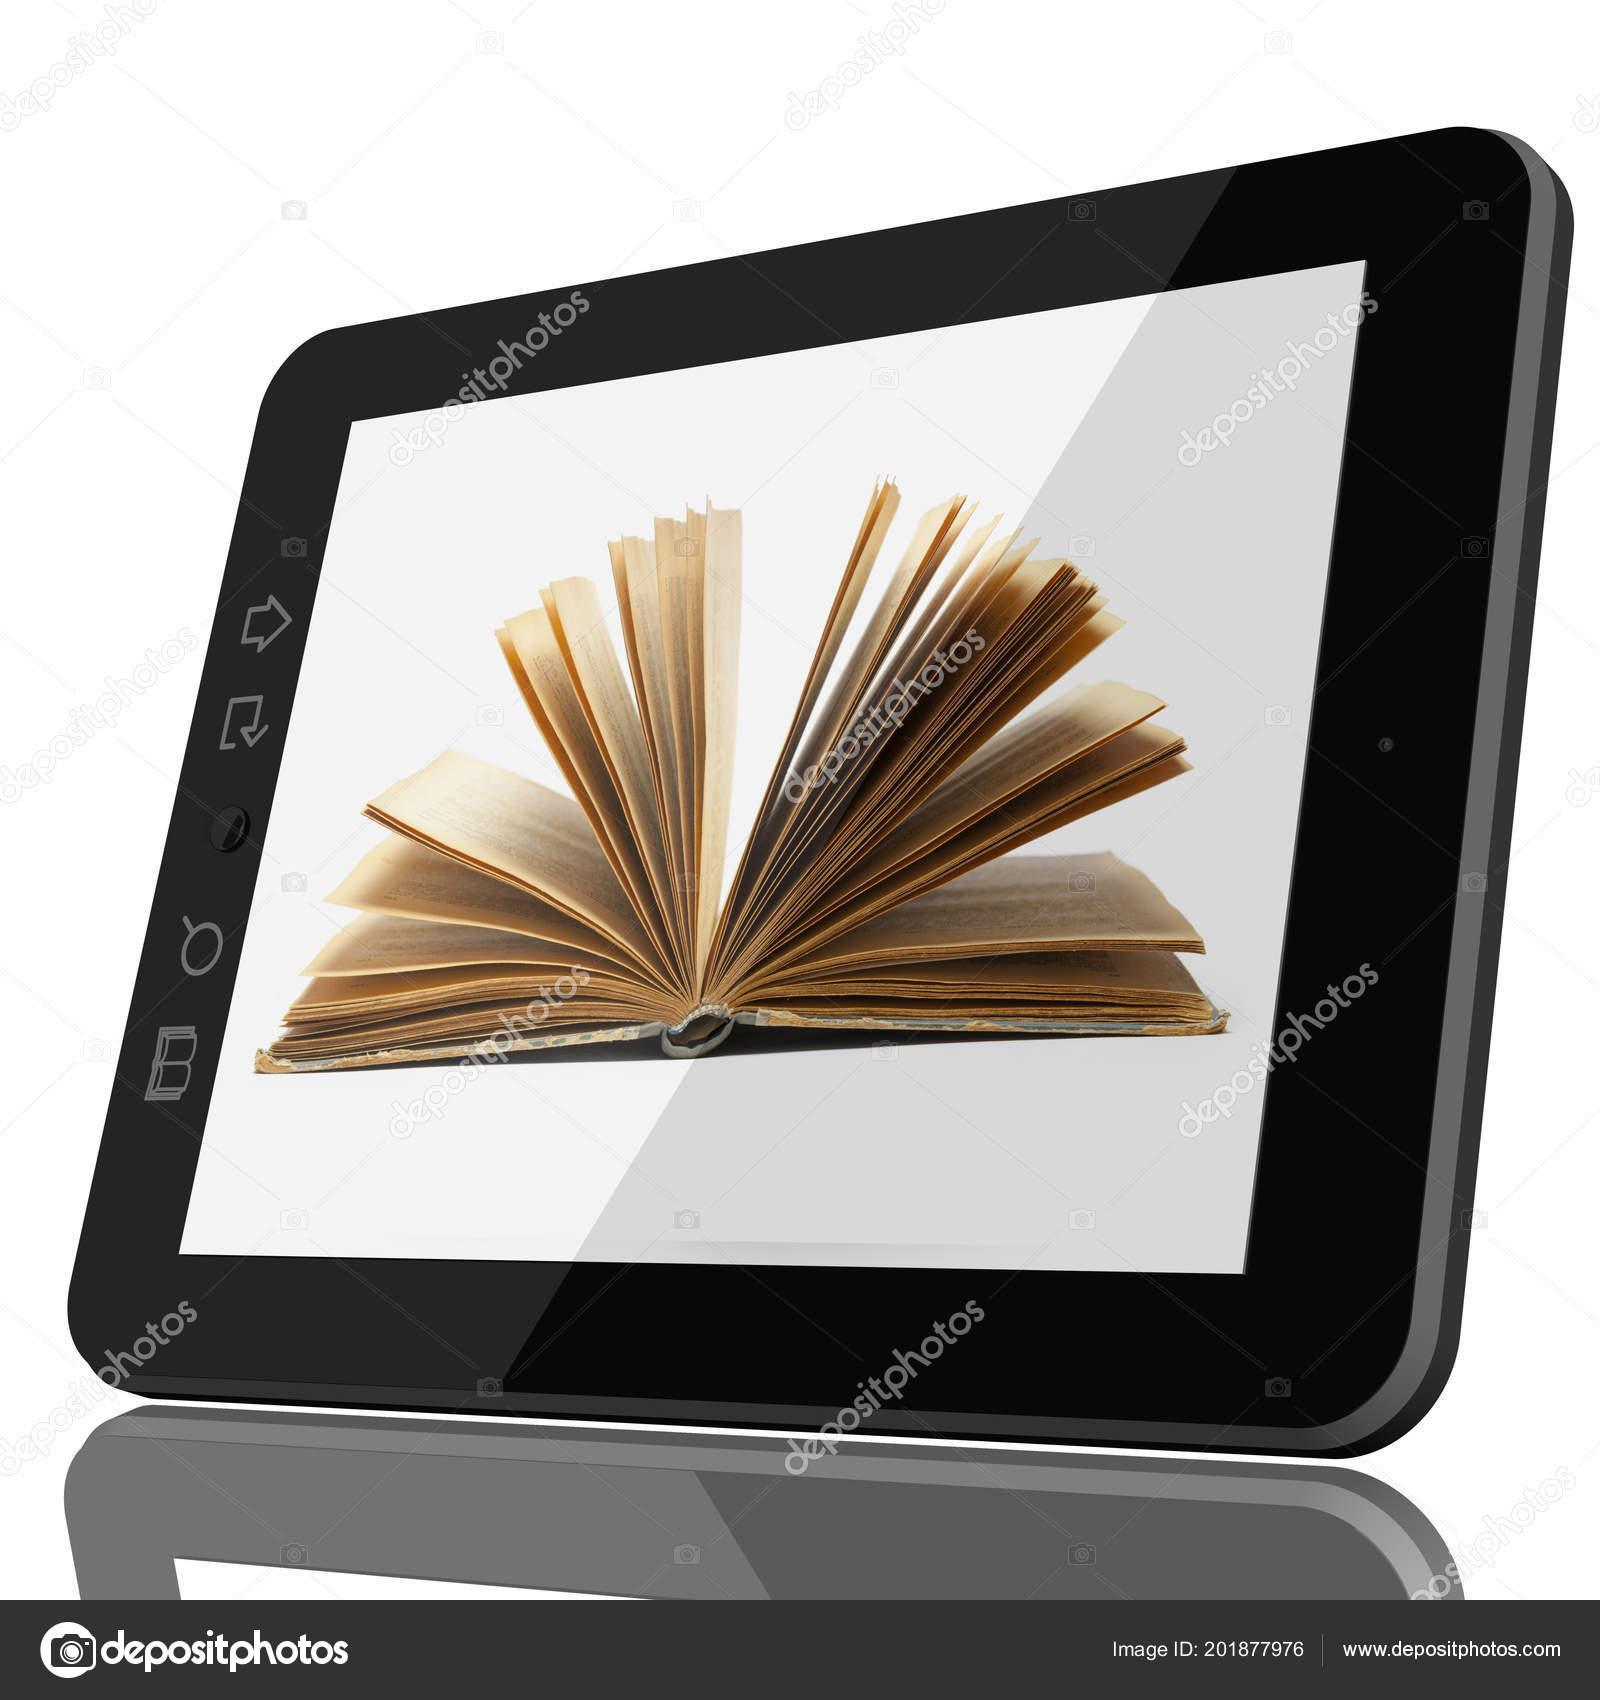 Digital Library Concept Open Book Teblet Computer Screen Model